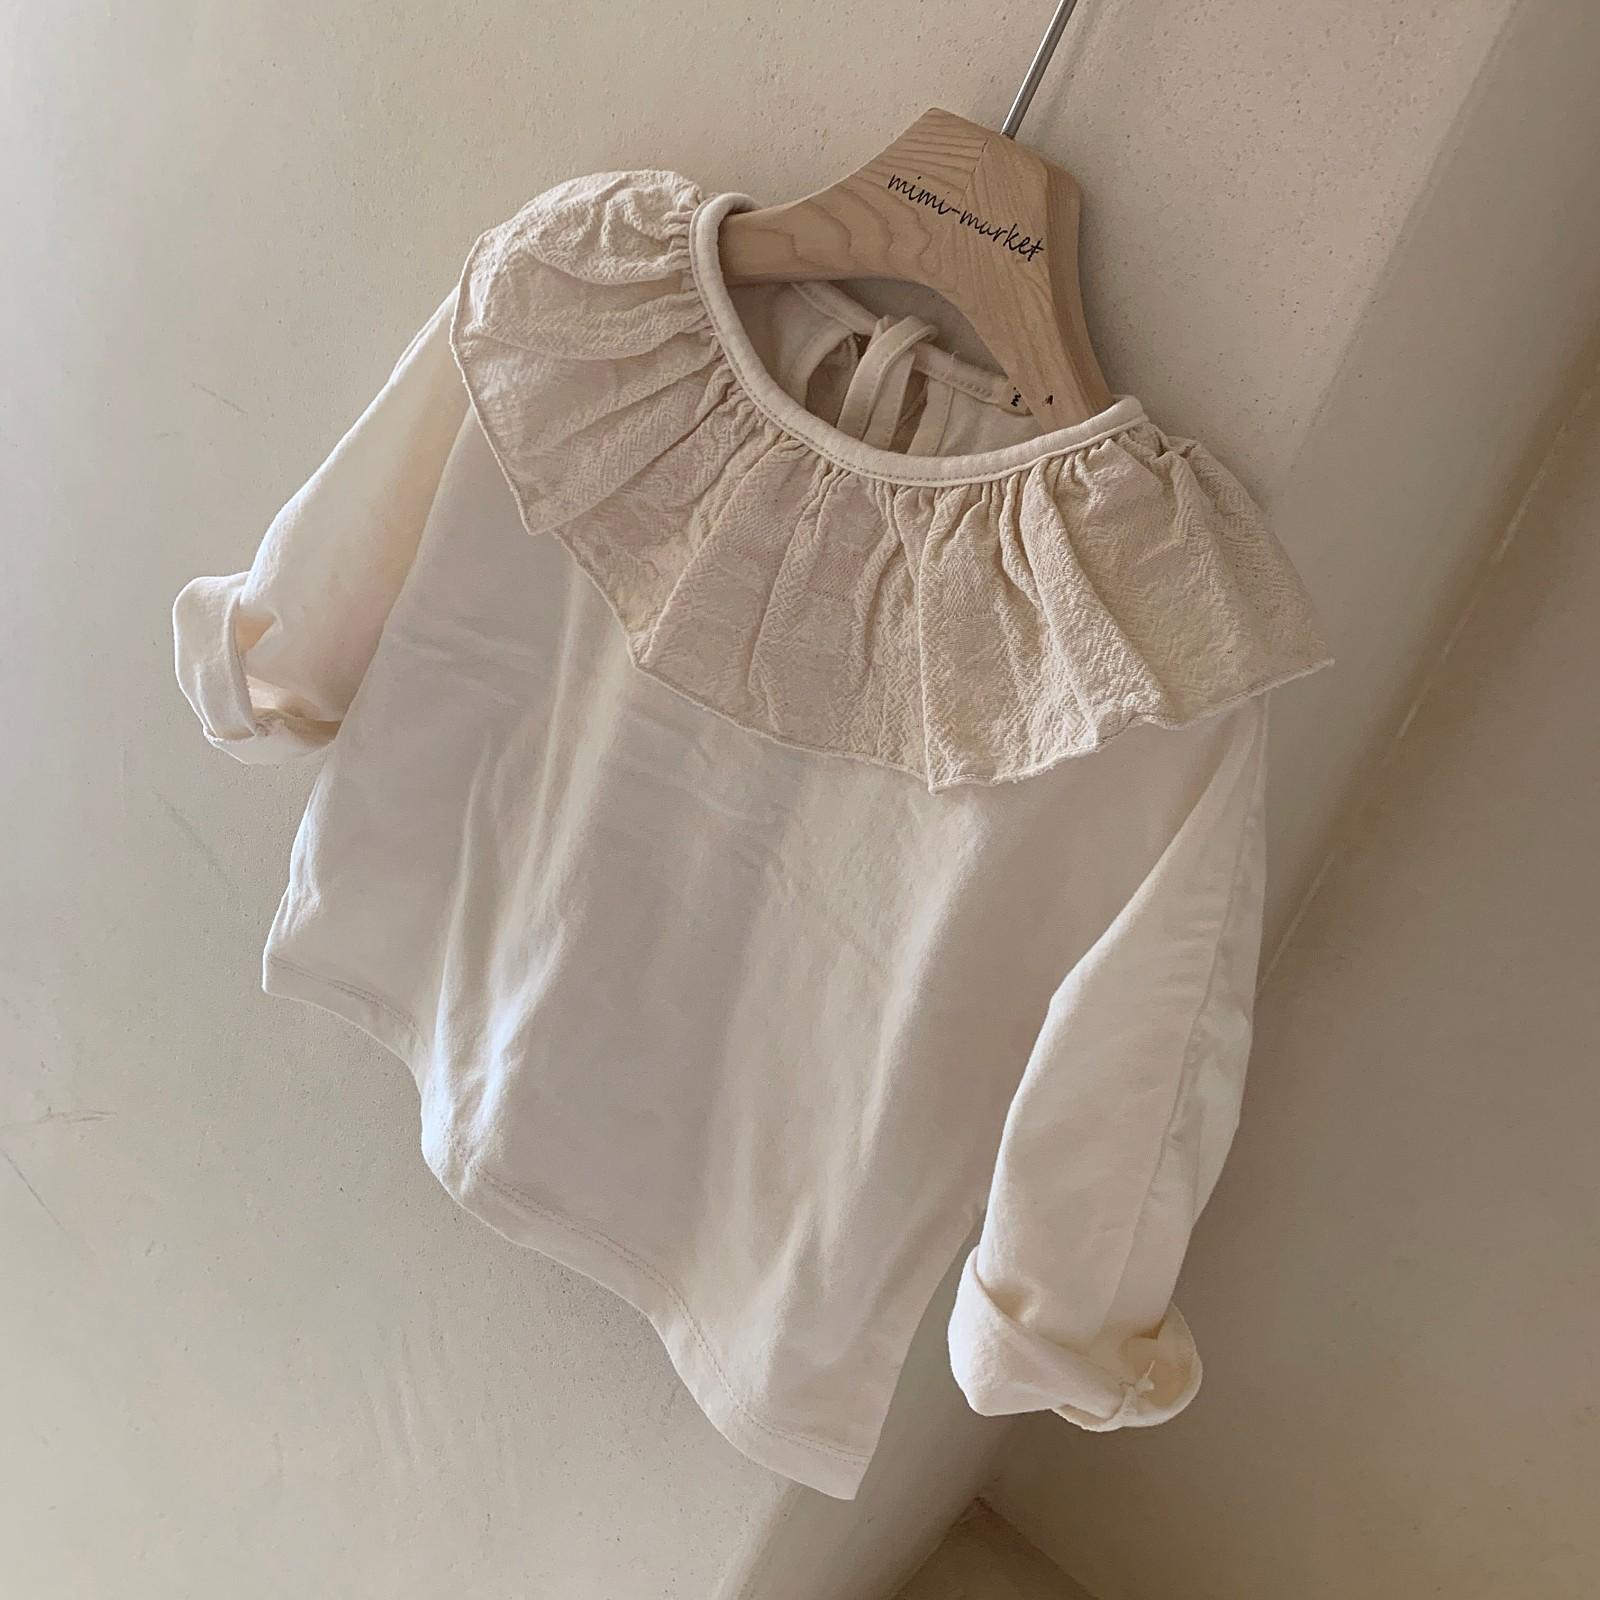 MIMI MARKET - Korean Children Fashion - #Kfashion4kids - Laura Collar Tee - 8